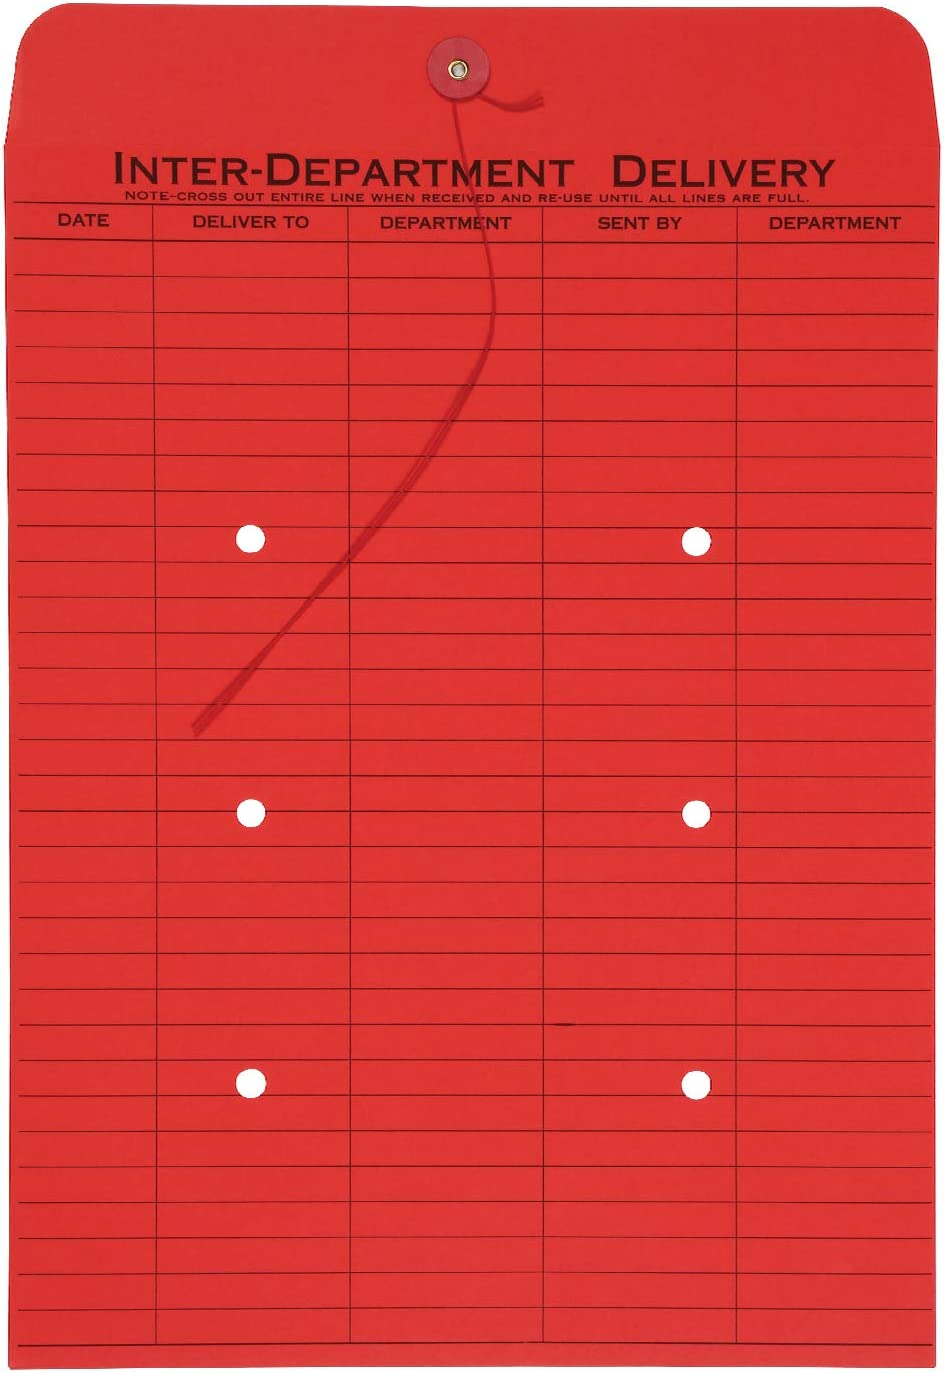 Quality Park 1-Side Print Interoffice Envelopes, String-Tie, Red, 10 x 13, 100 per Carton, (63574)